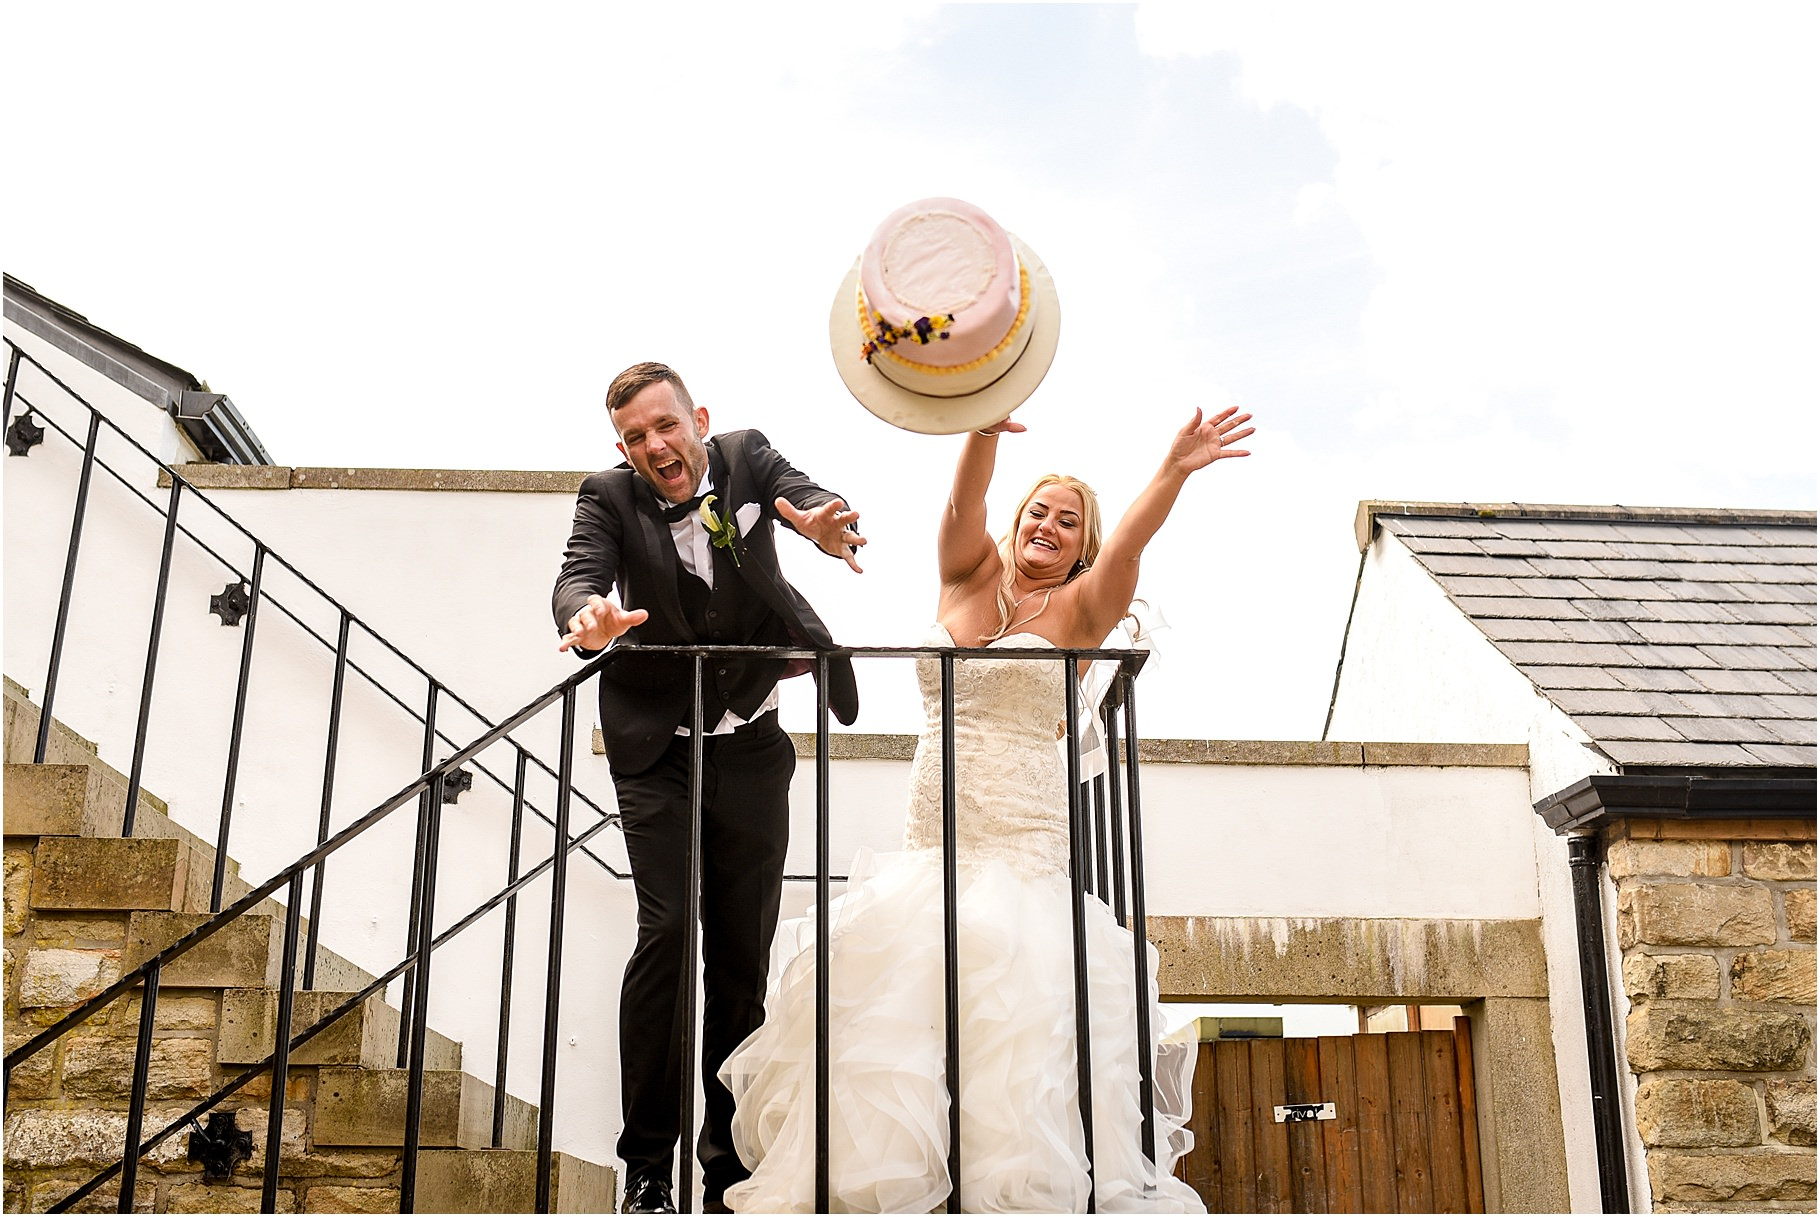 dan-wootton-photography-2017-weddings-066.jpg